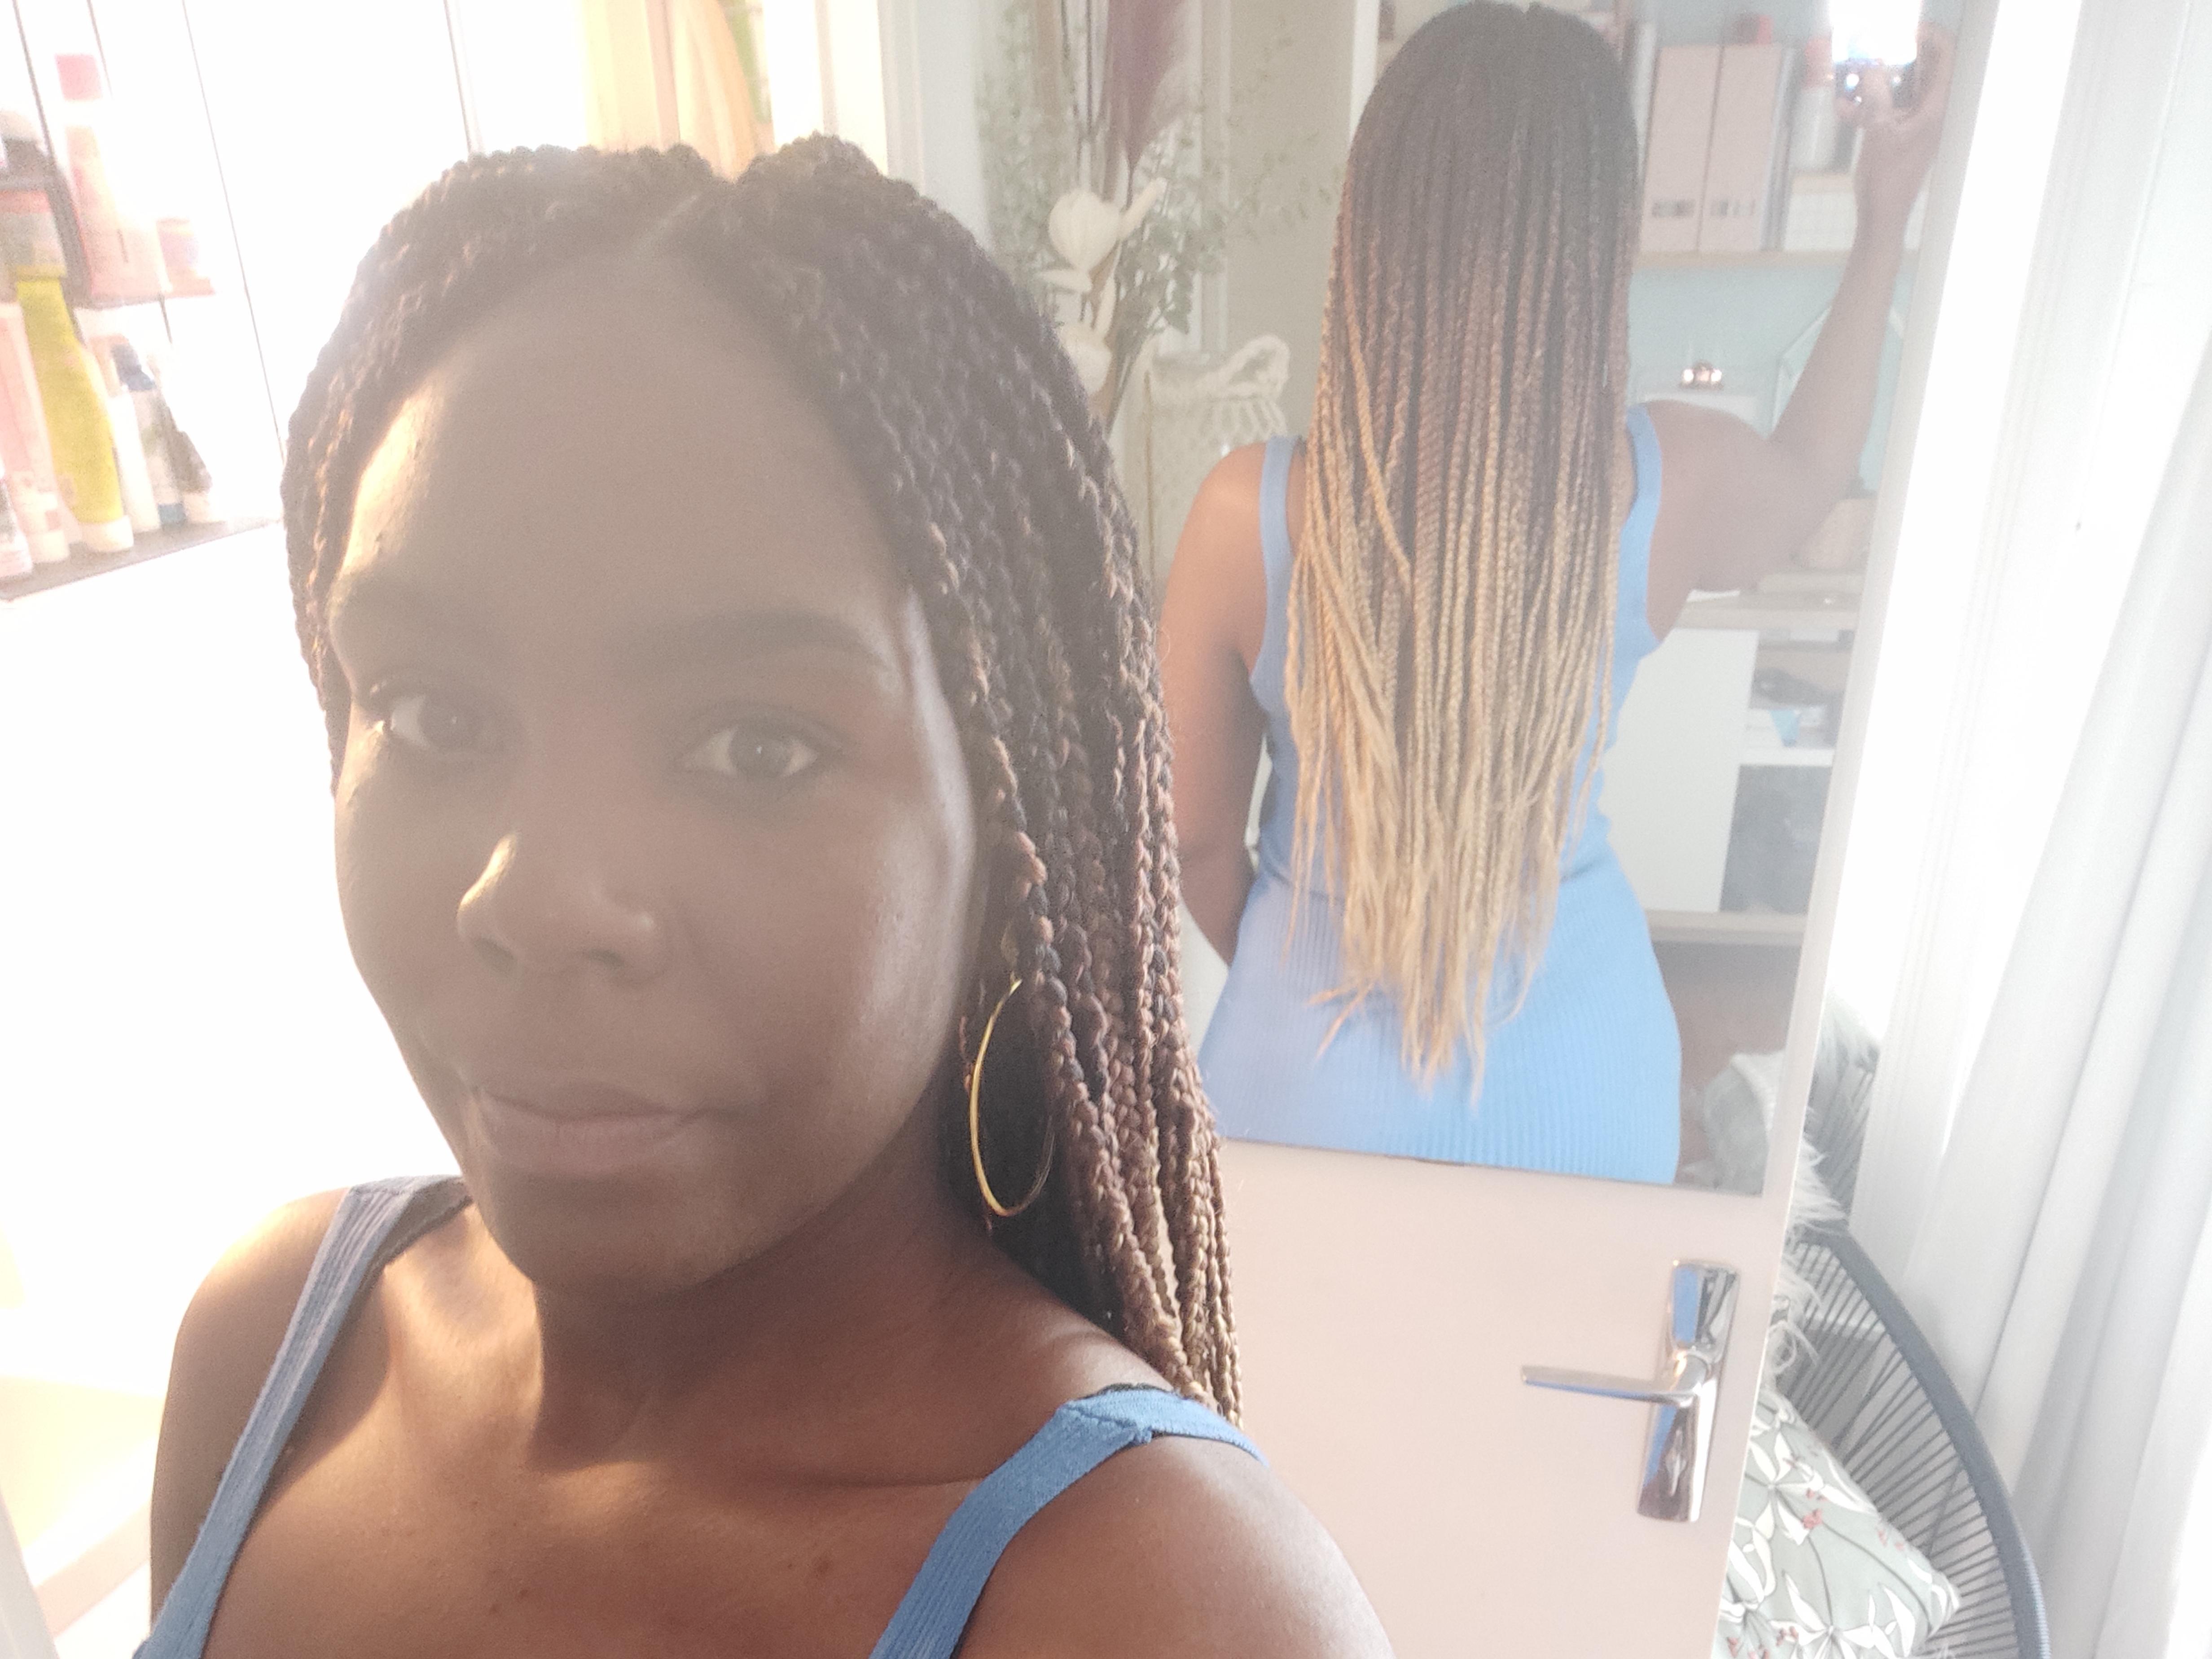 salon de coiffure afro tresse tresses box braids crochet braids vanilles tissages paris 75 77 78 91 92 93 94 95 MGBSKHDU